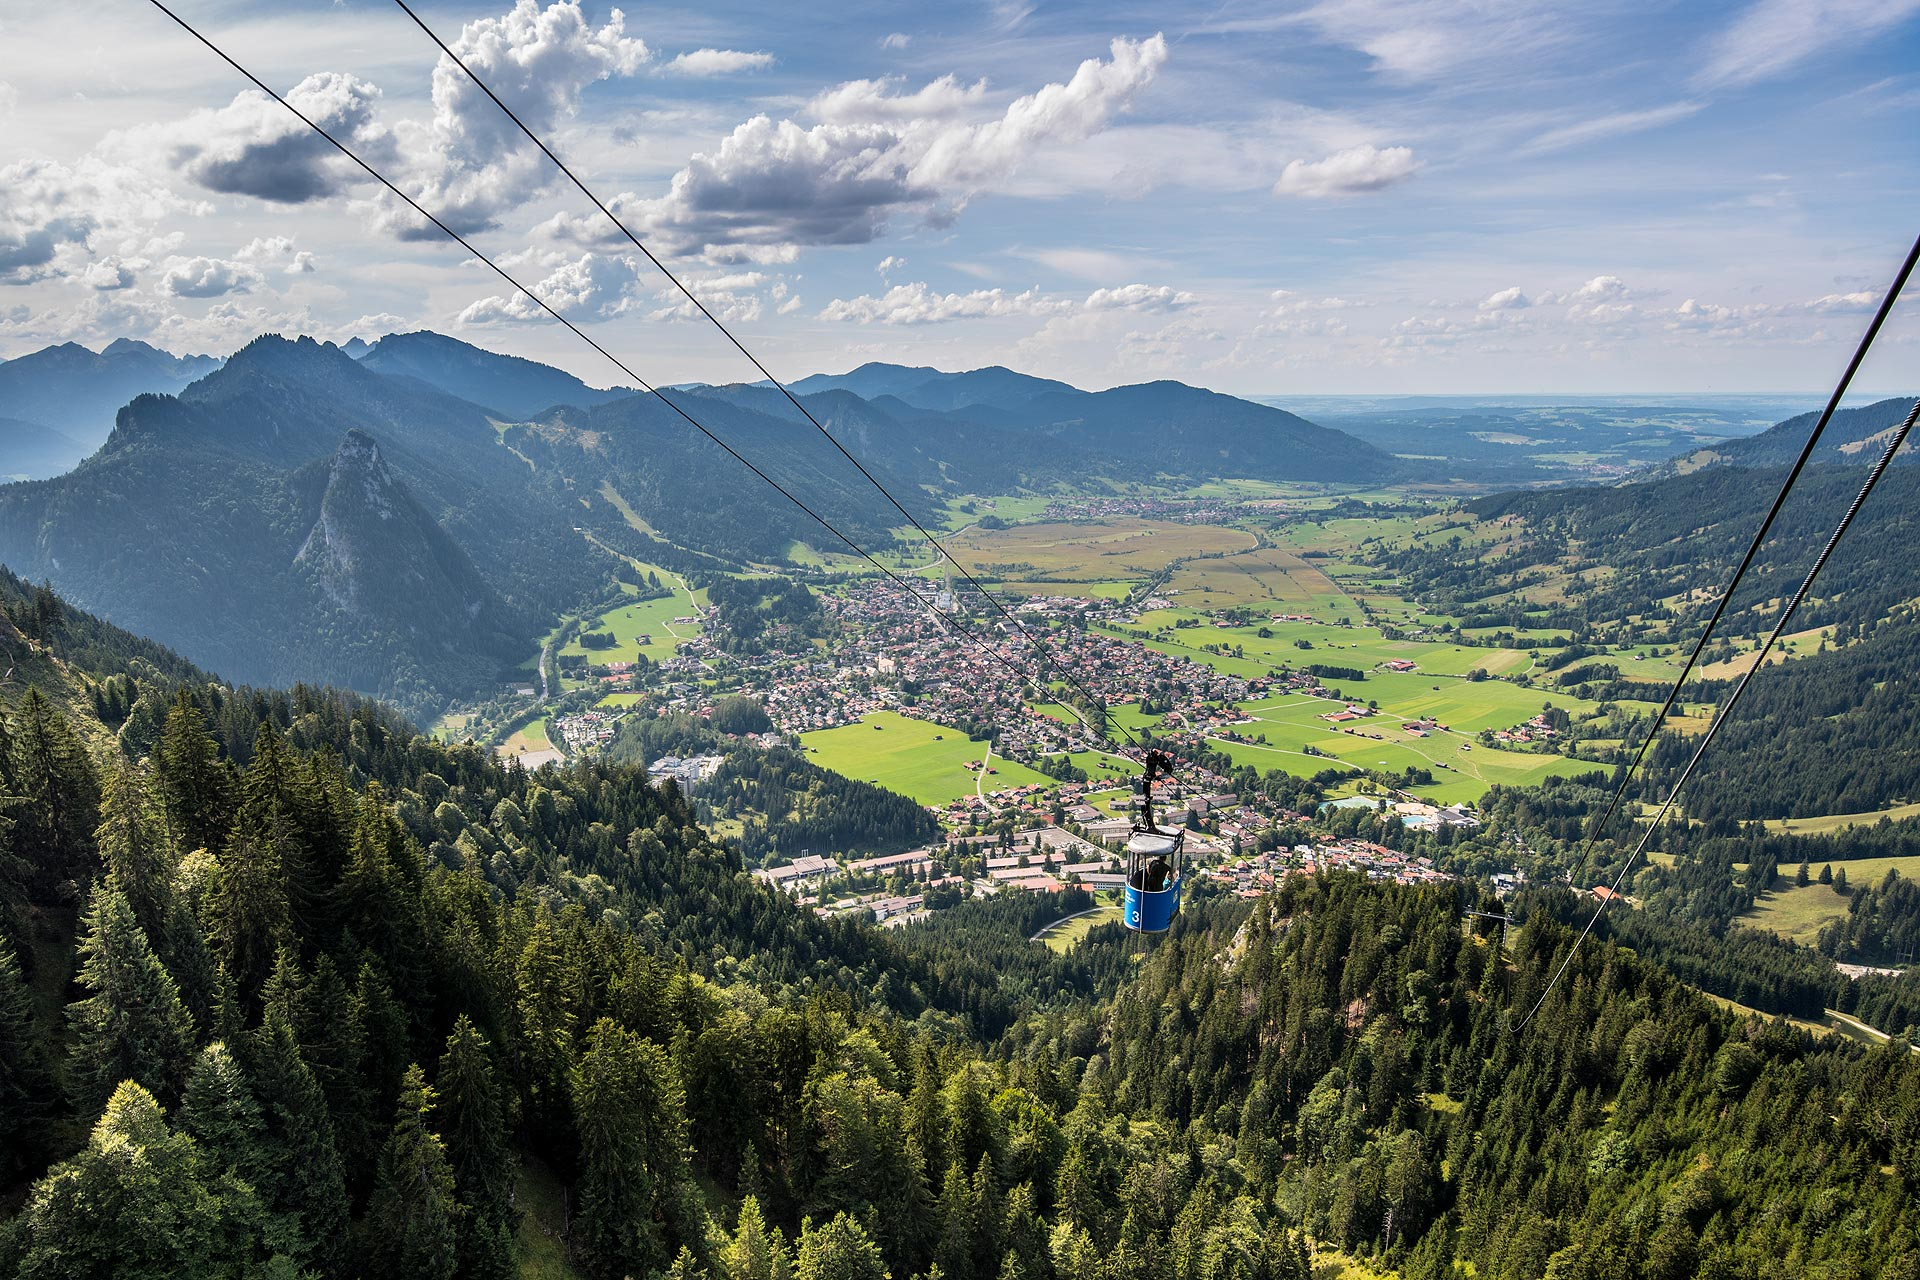 Wandertour & Nostalgische Gondelfahrt zum Laber Berg